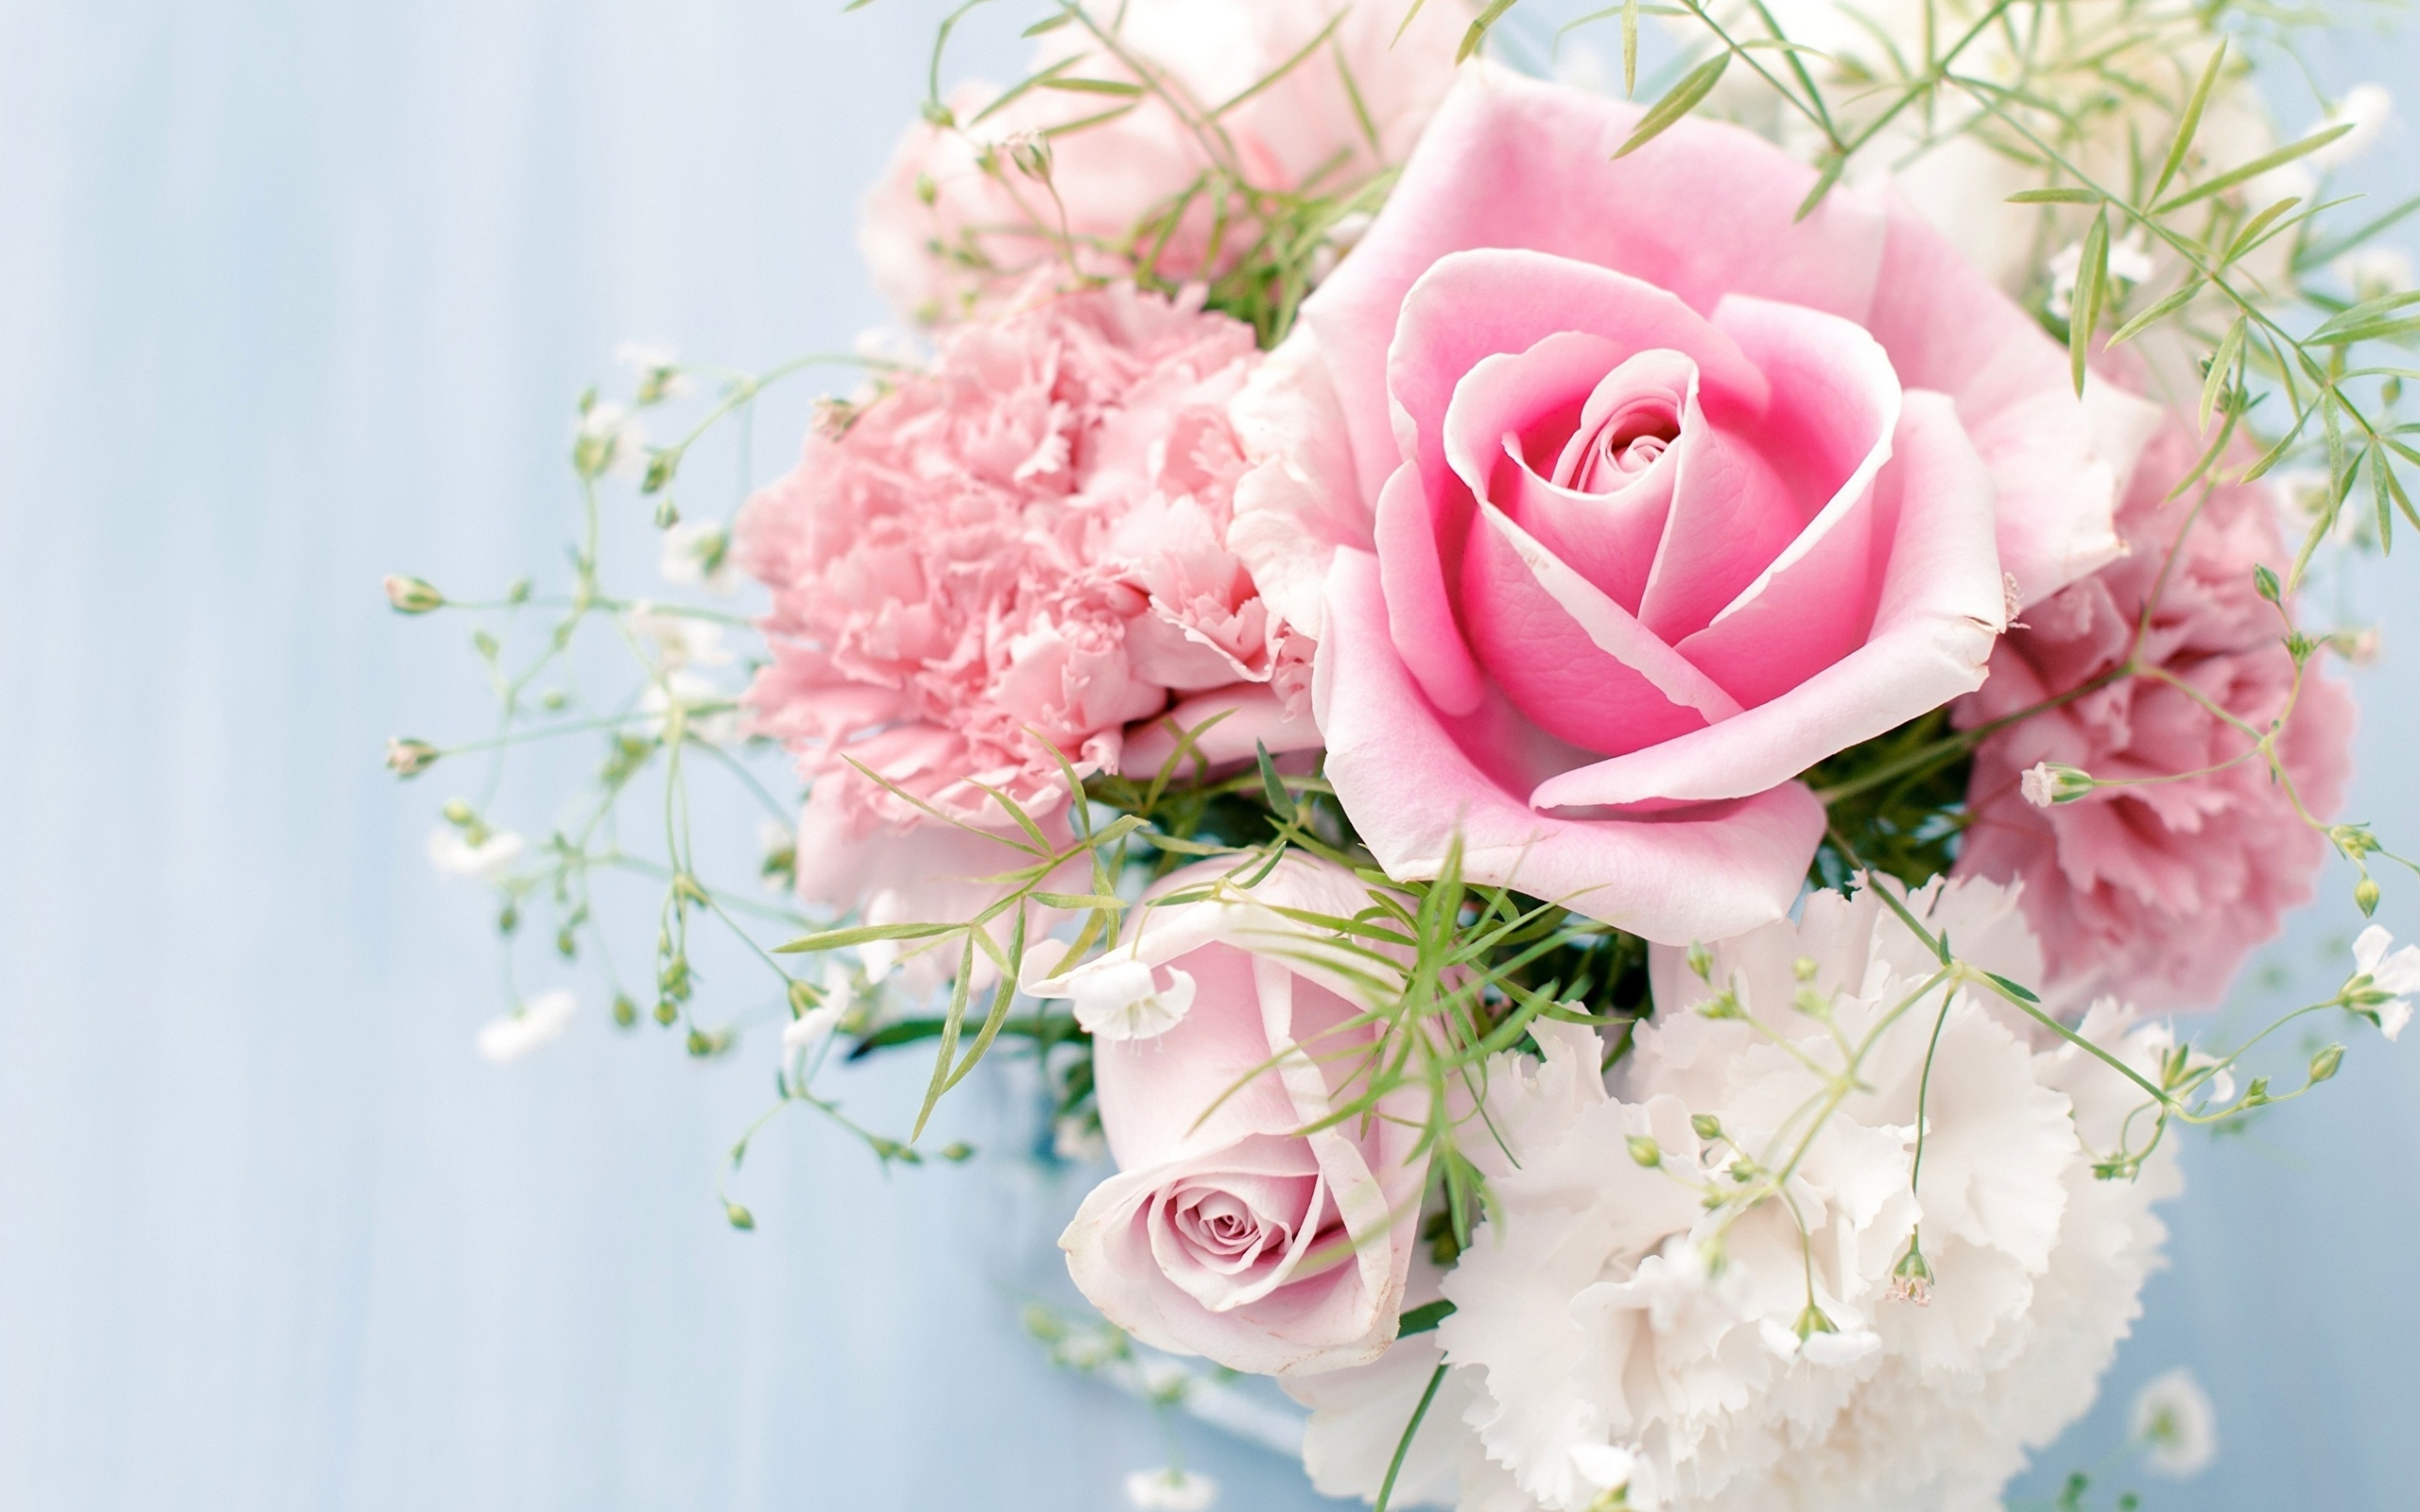 Открытки без надписей с розами